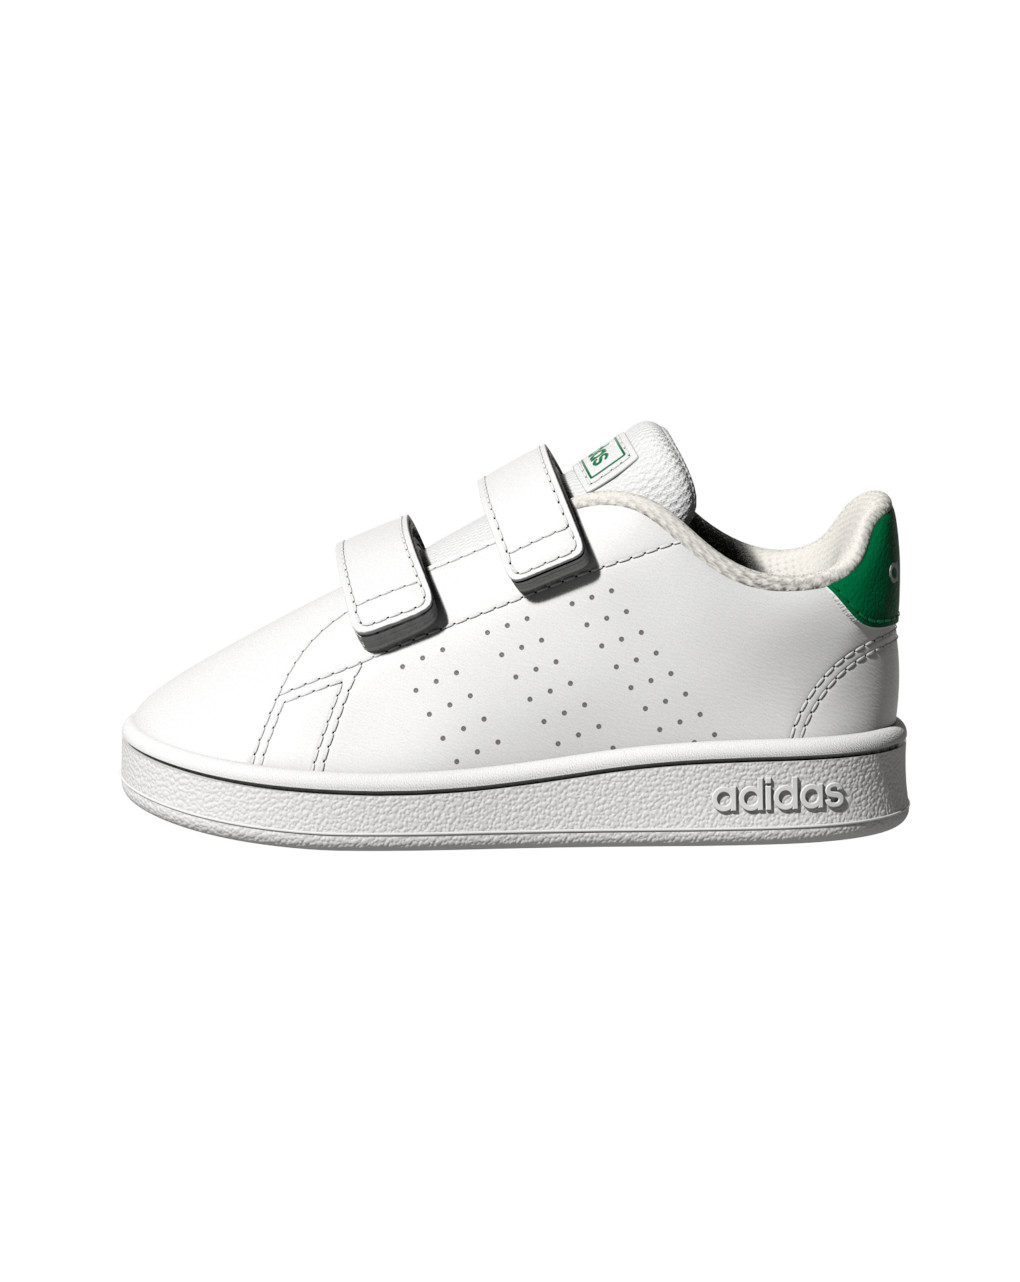 Advantage i - Adidas